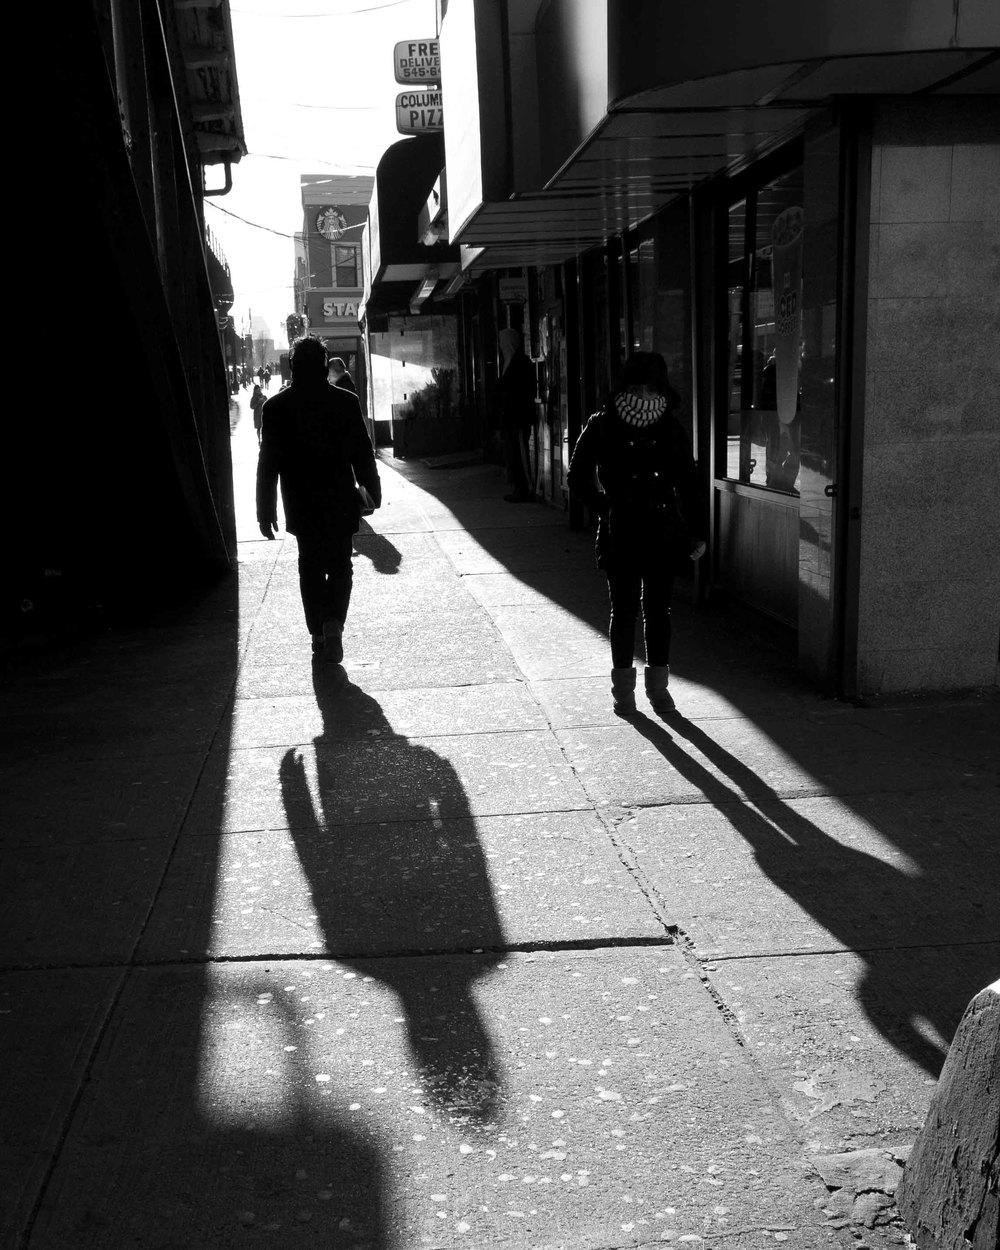 Streetphotography 3.0-78.jpg